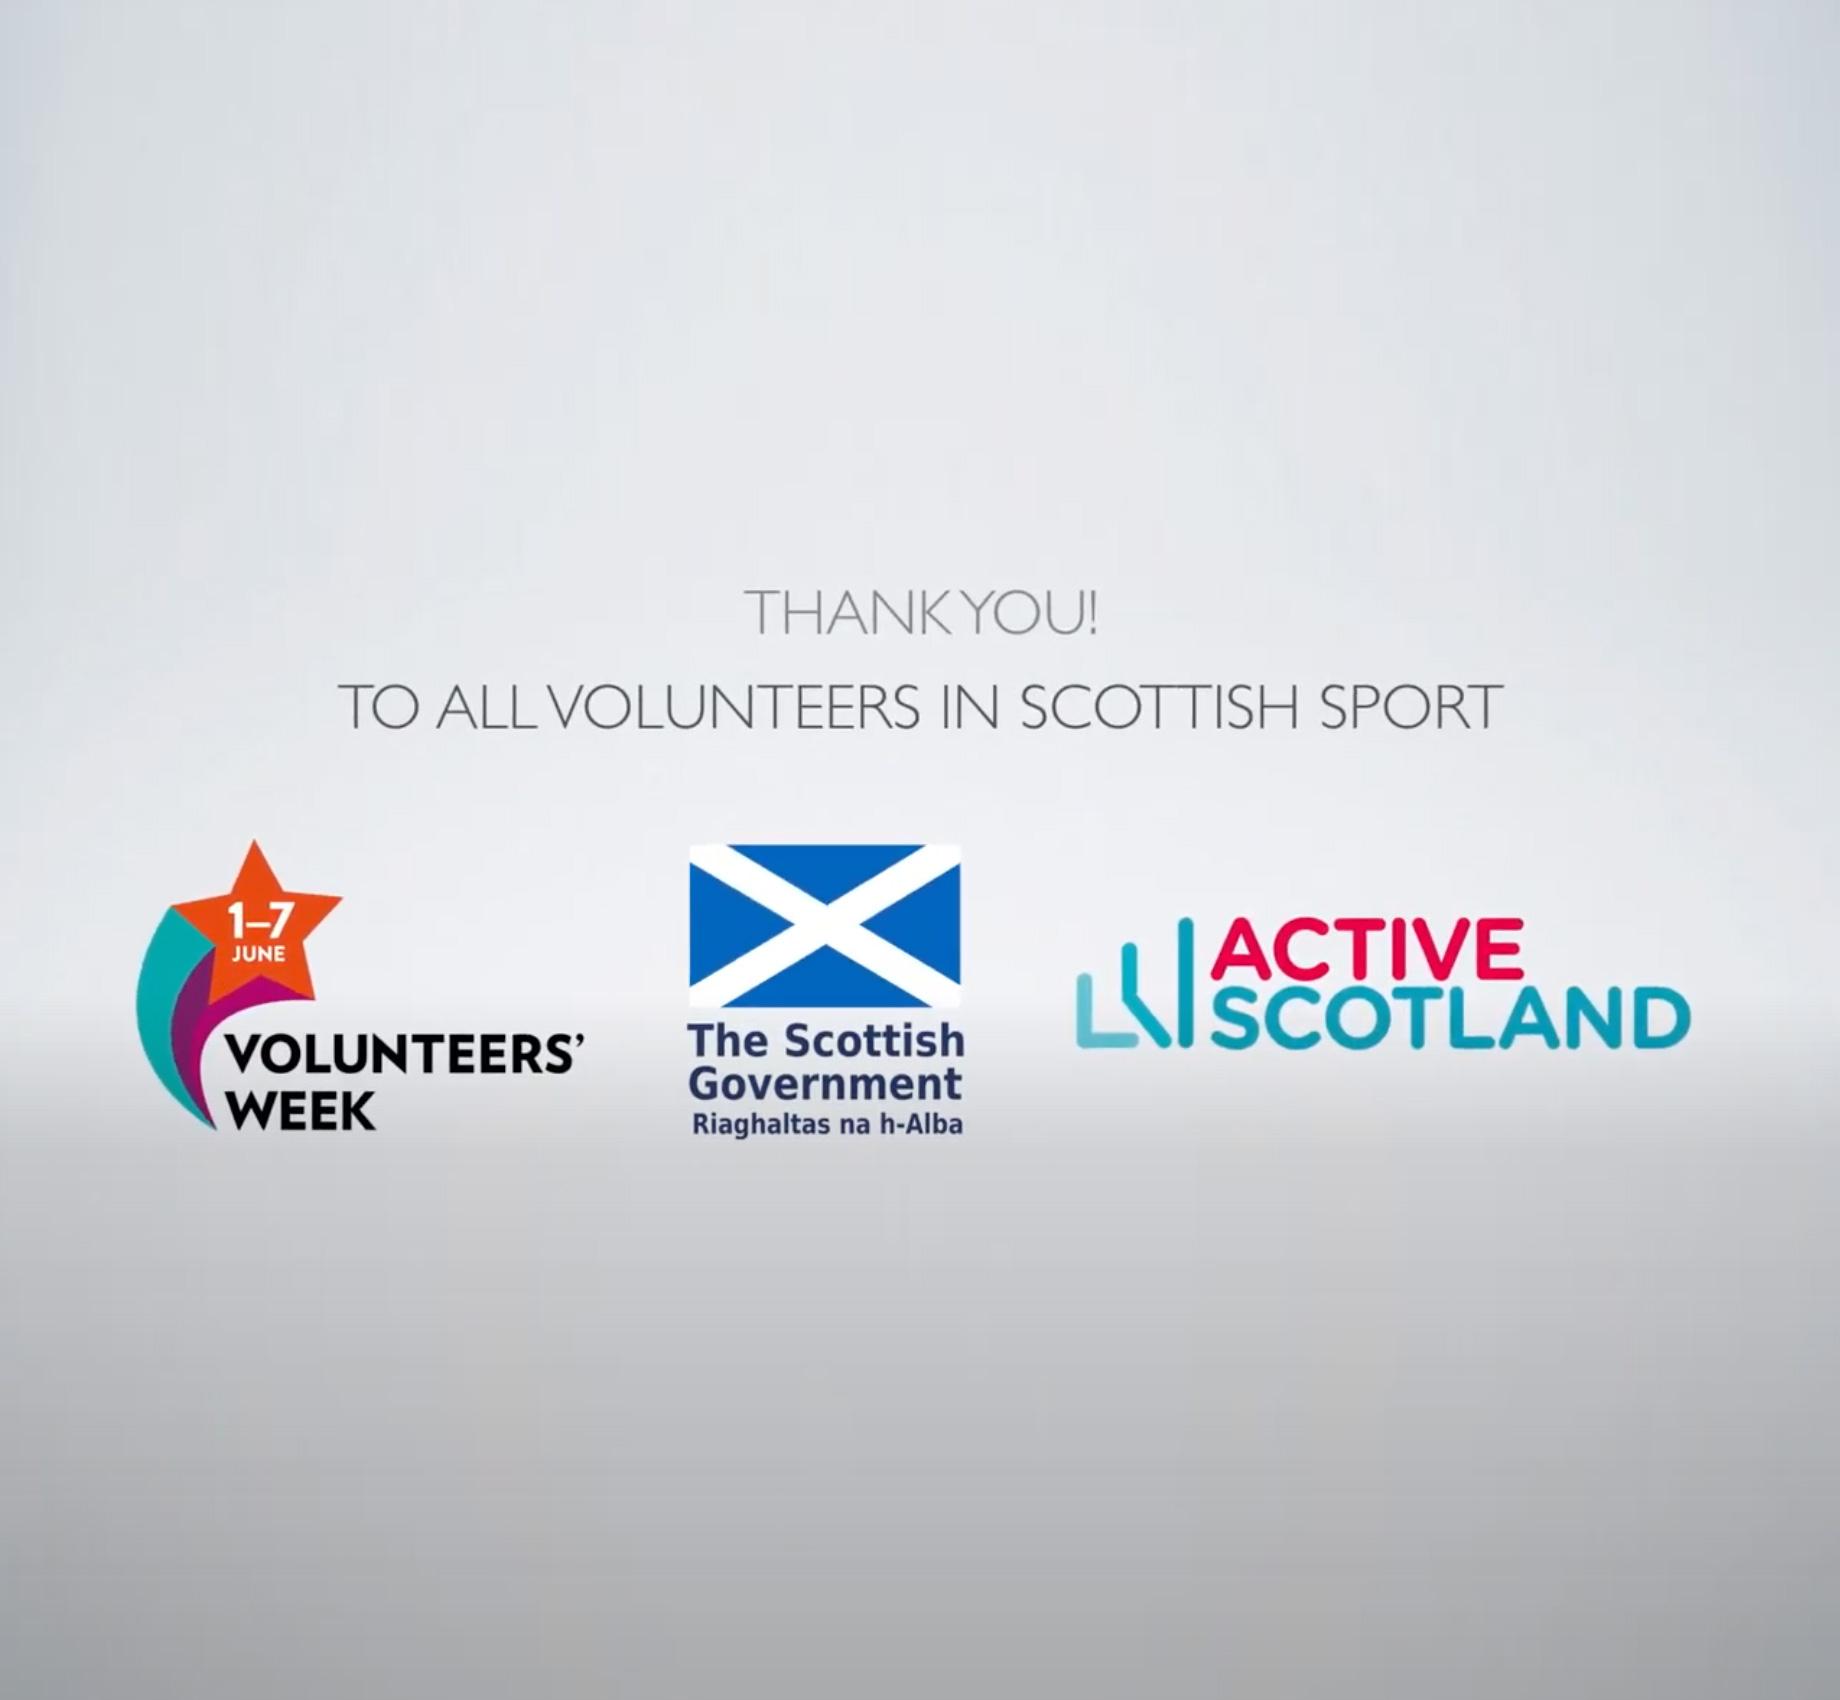 Volunteer thanks